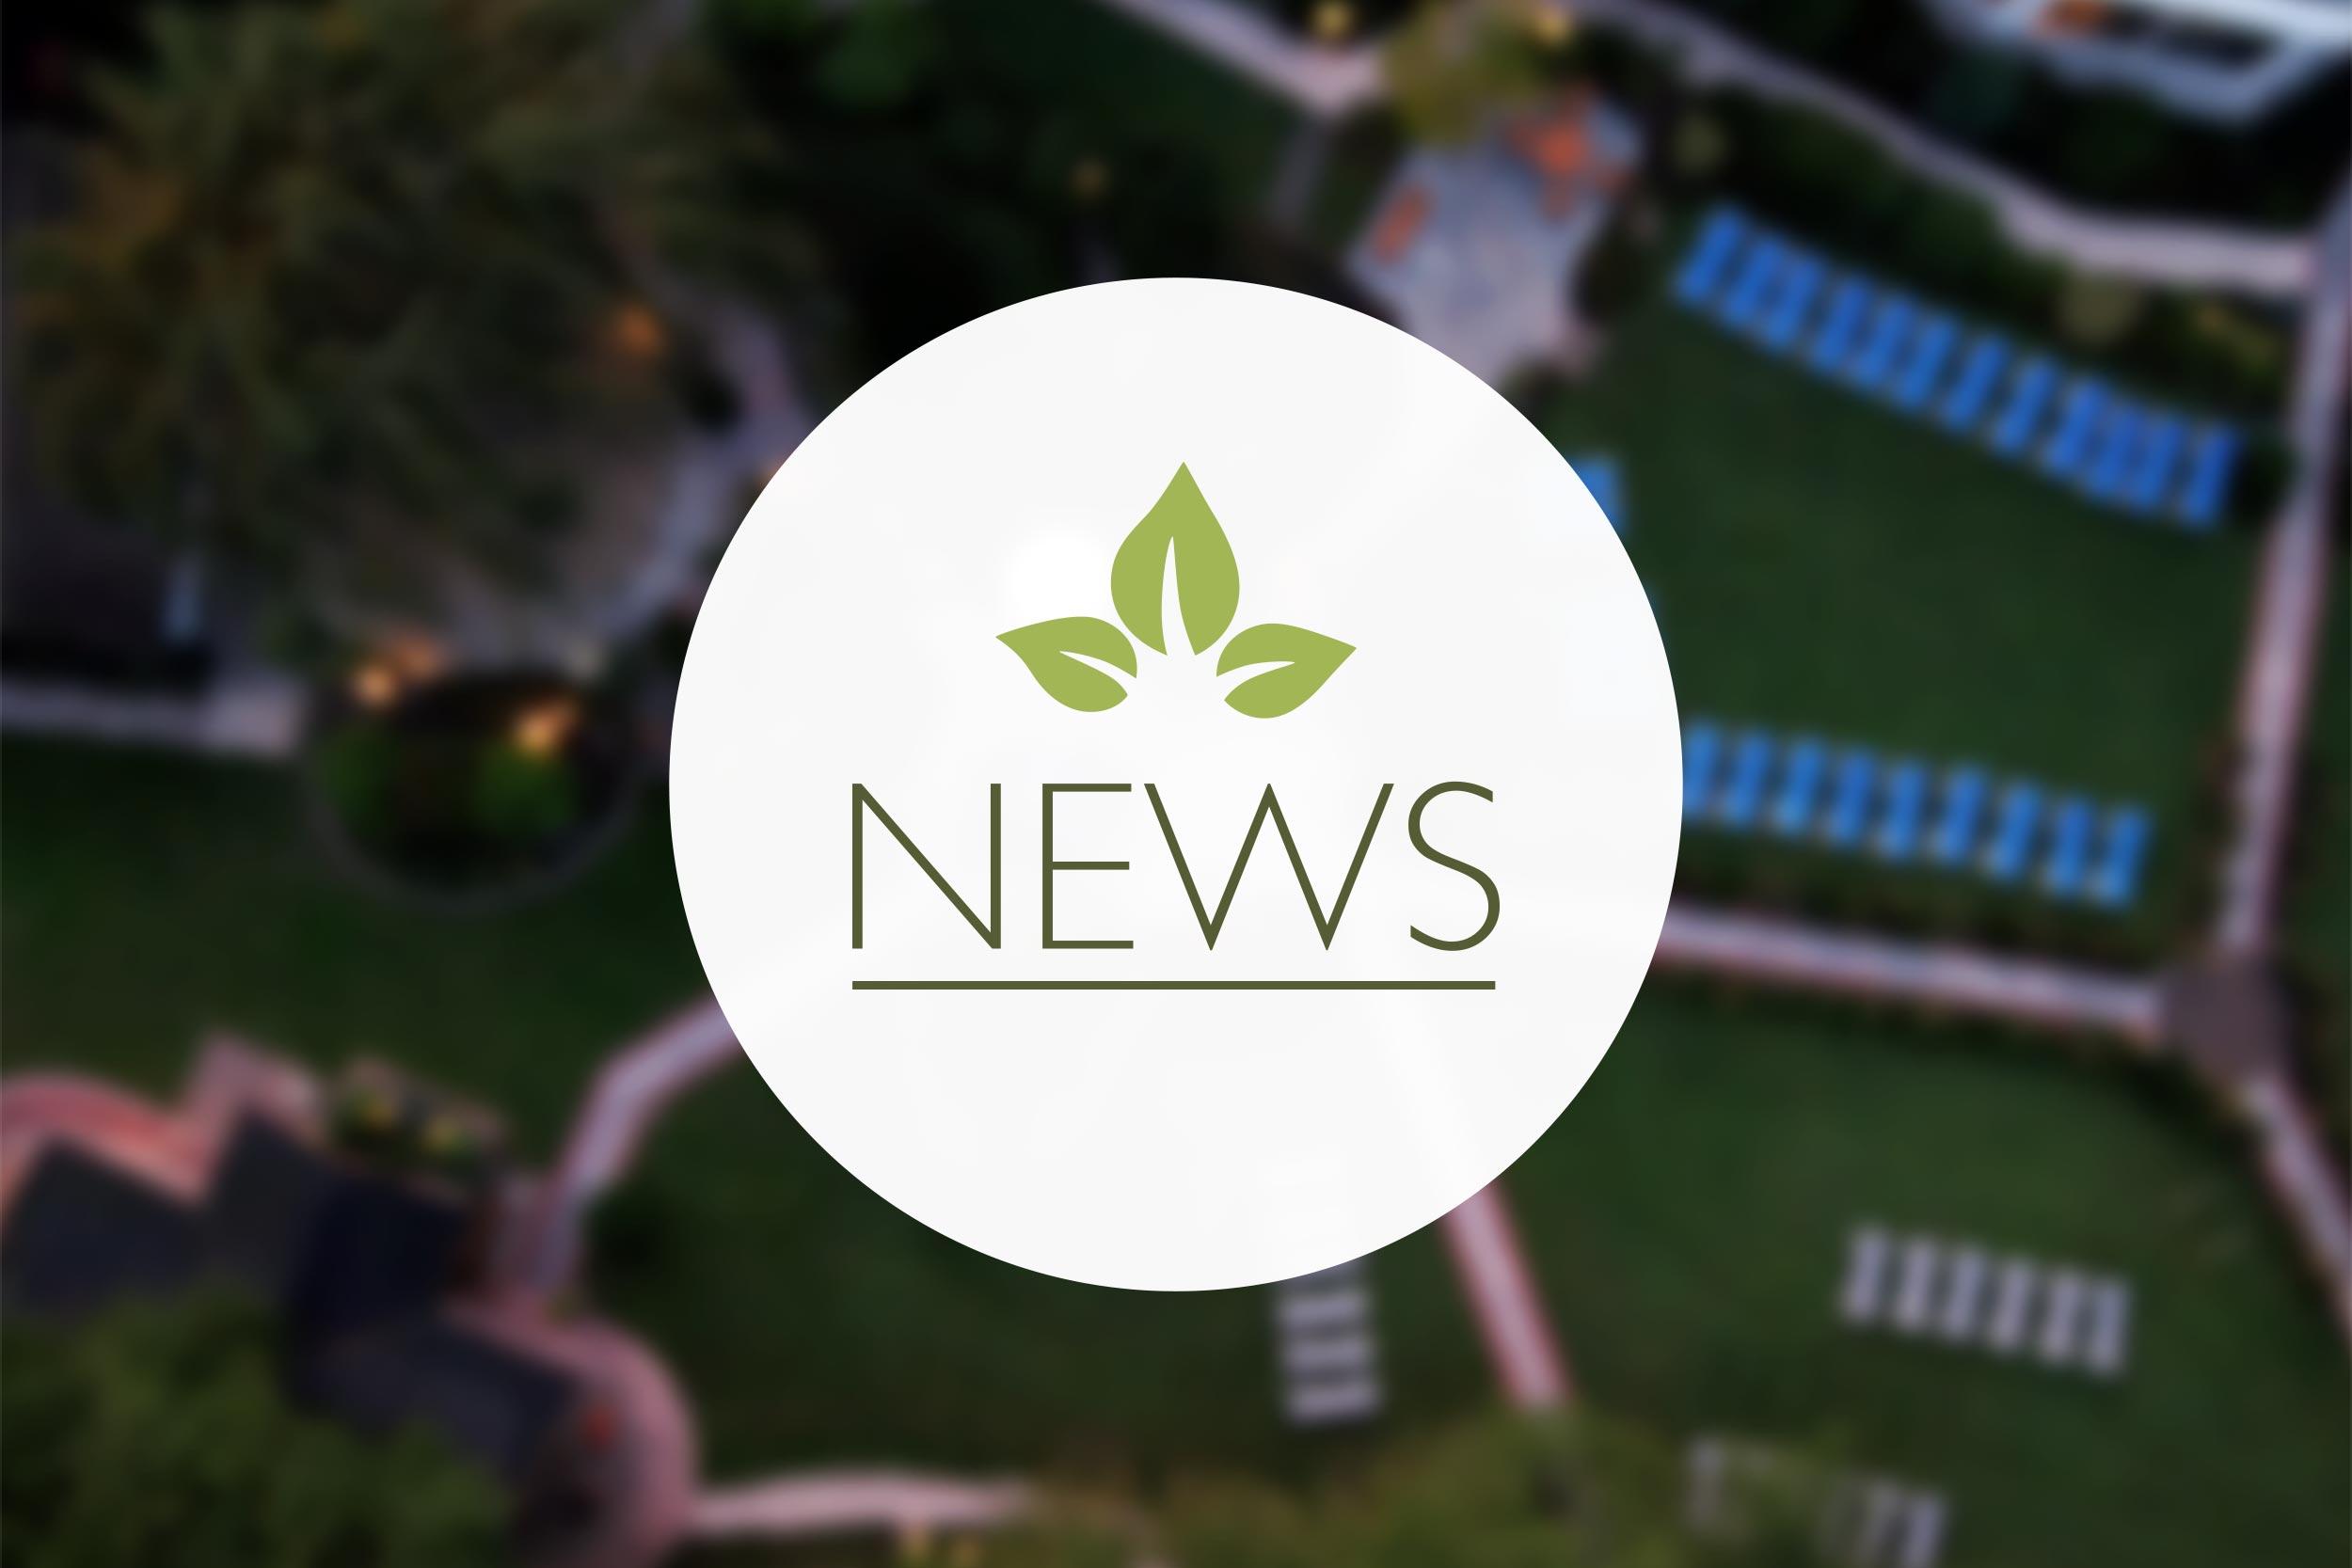 Saunapark News